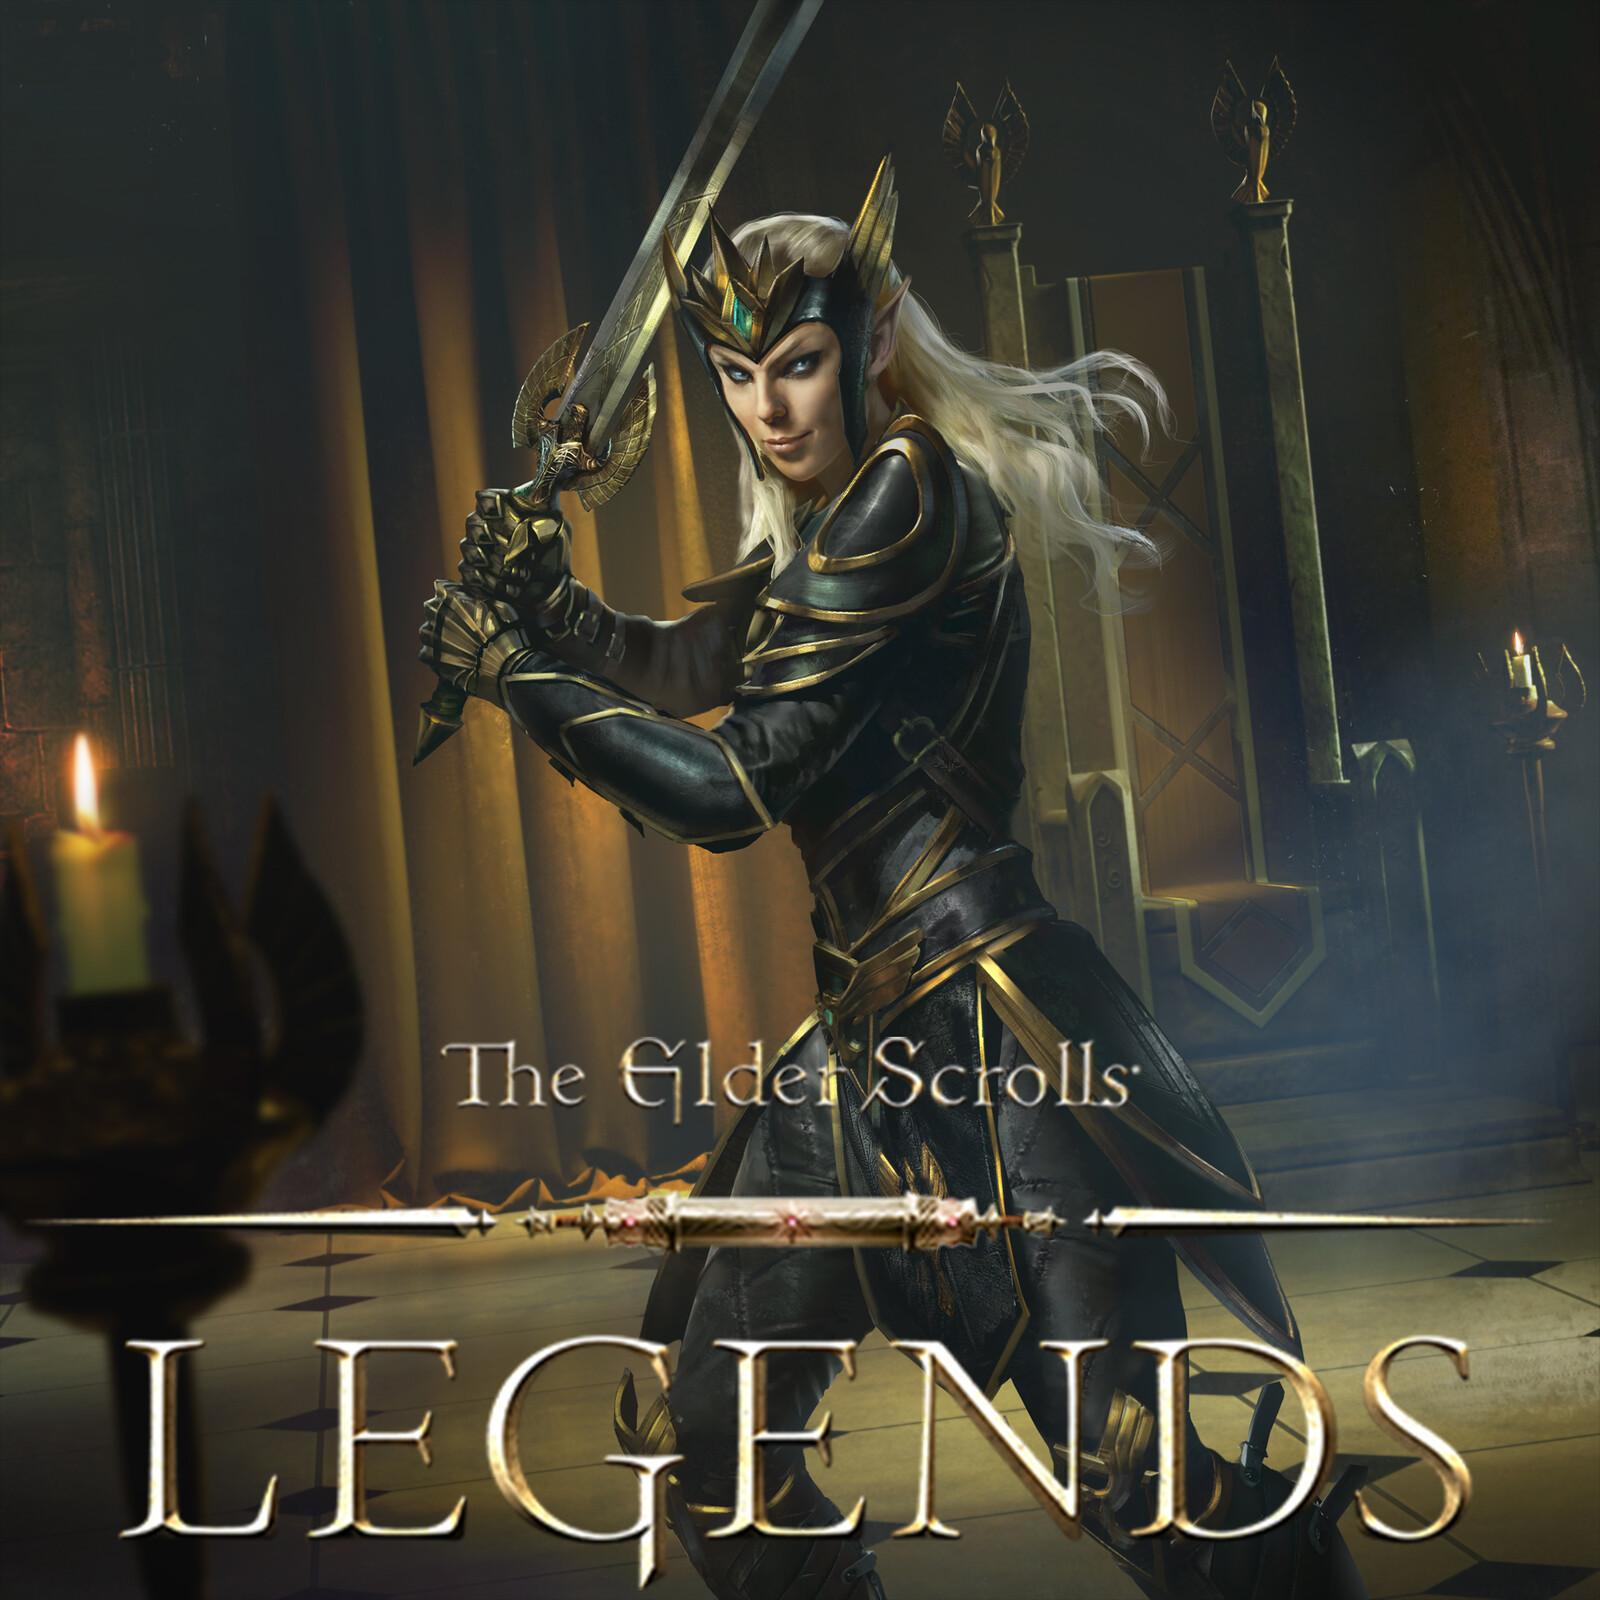 Ayrenn, Dominion Queen - The Elder Scrolls: Legends